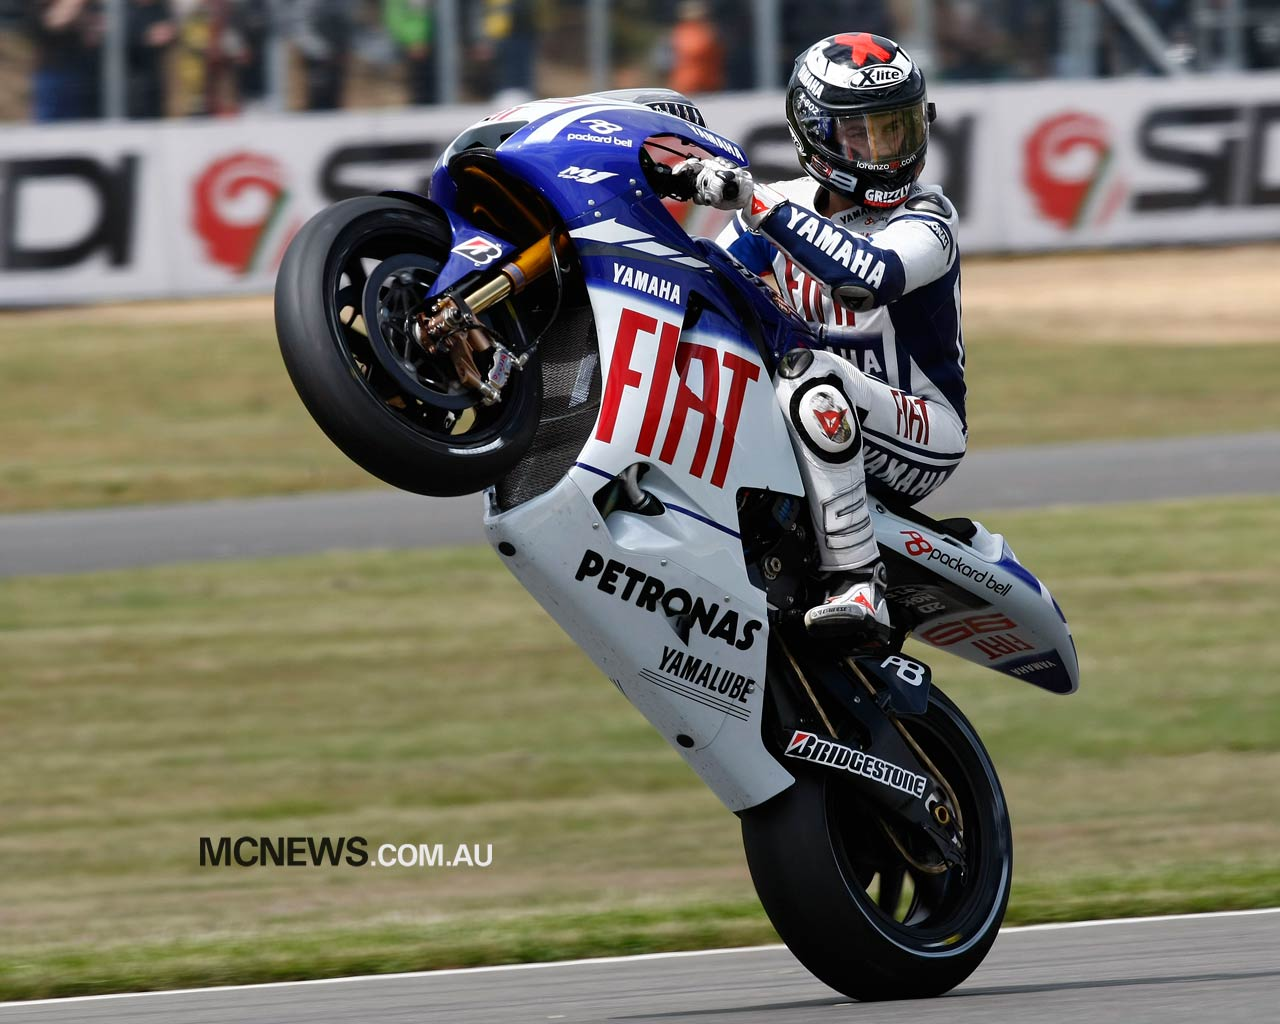 Jorge Lorenzo Jump Bike MotoGP Wallpaper Deskt 829 Wallpaper 1280x1024